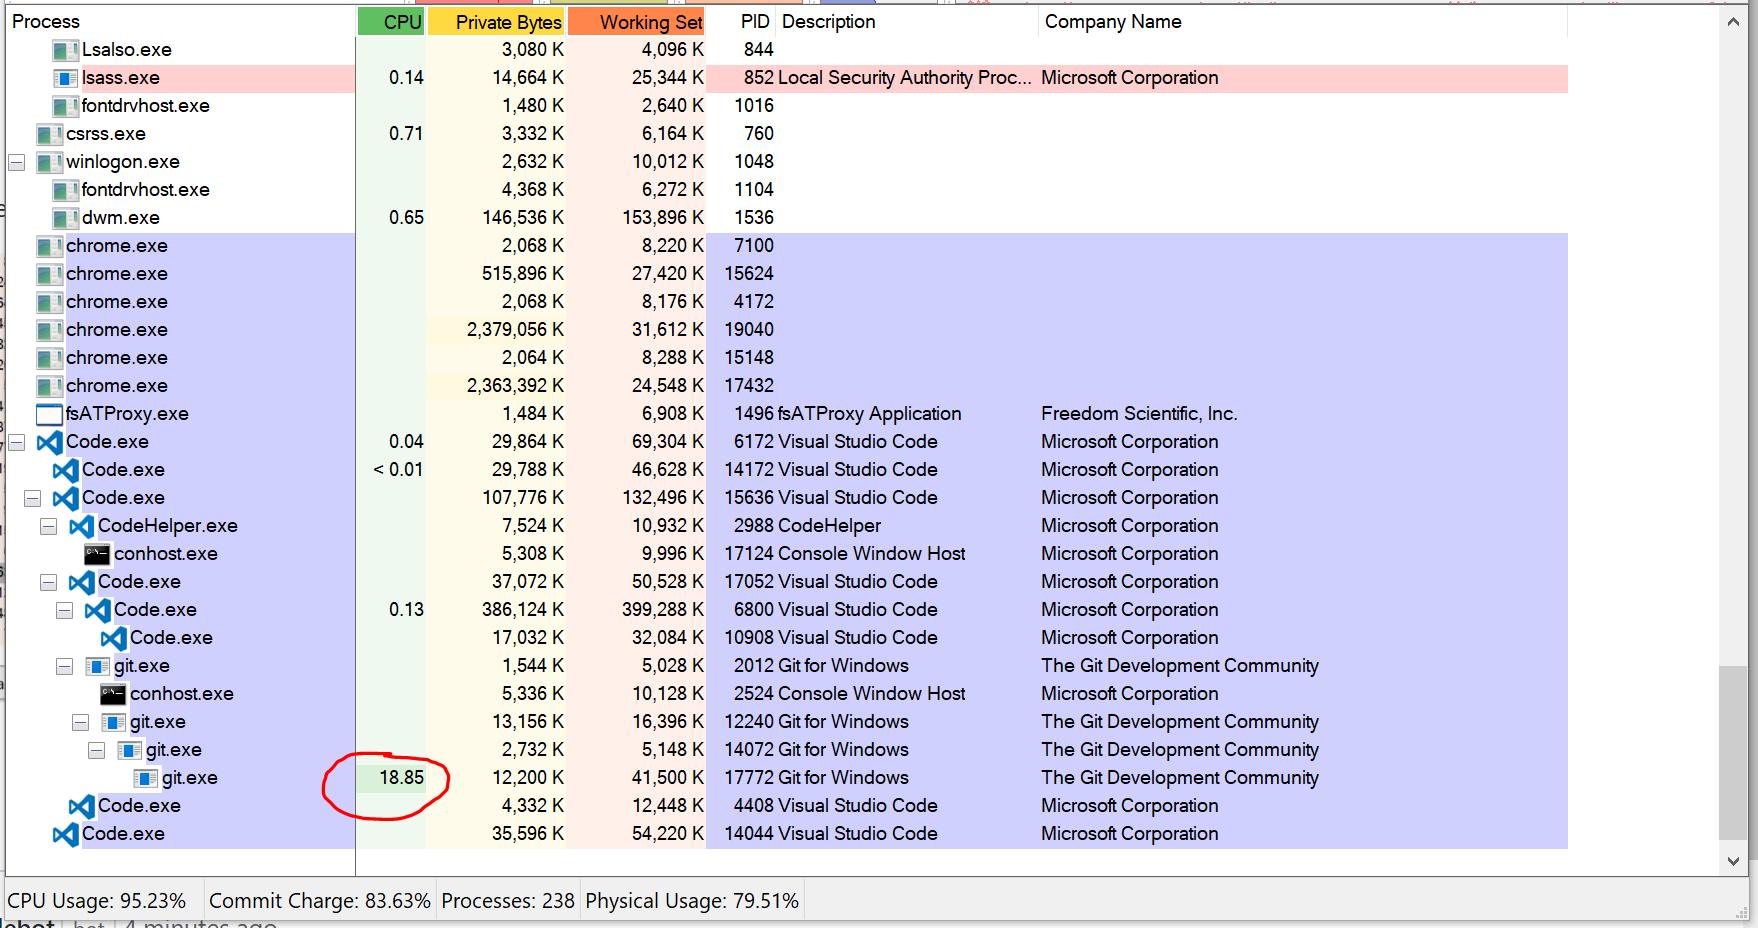 dwm.exe running in processes